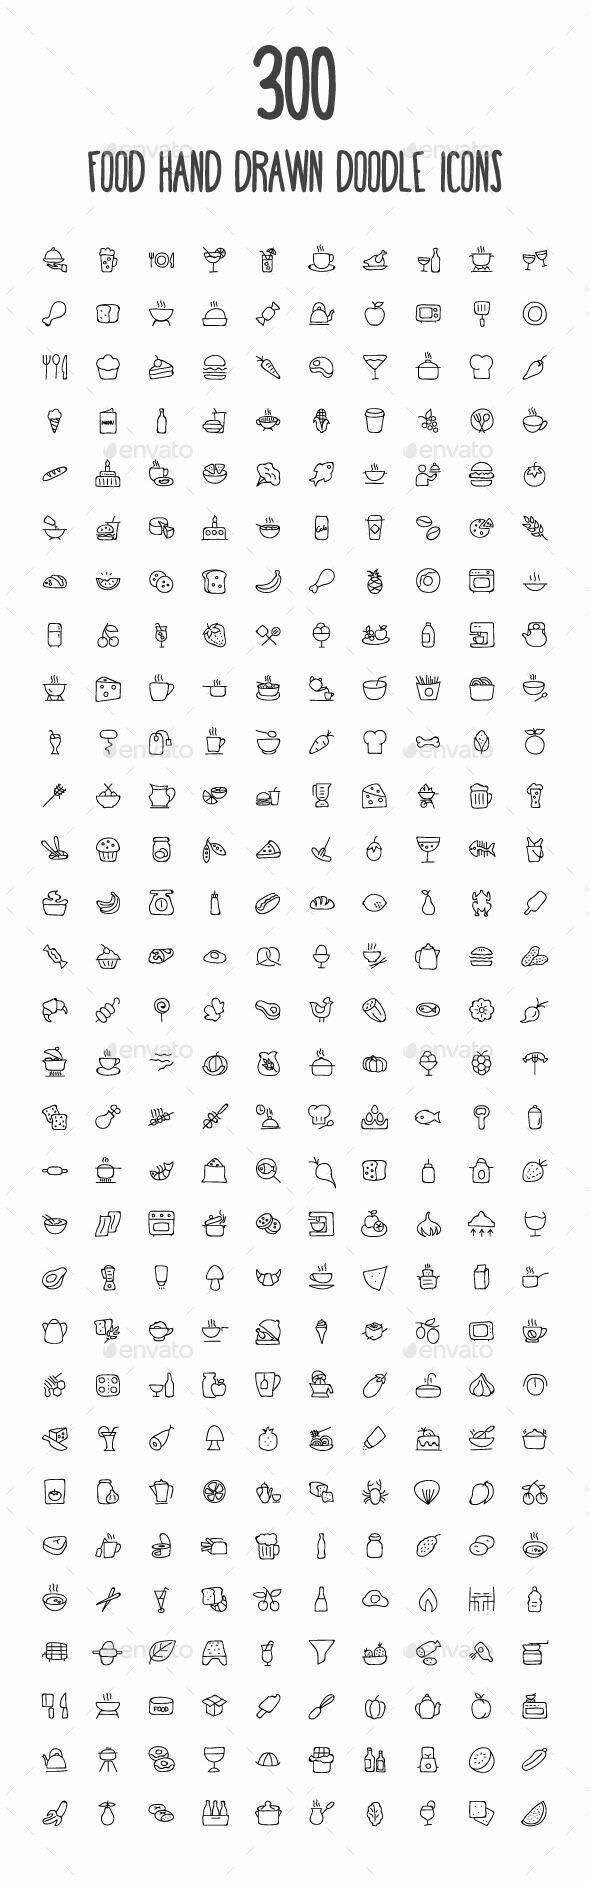 300 food hand drawn doodle icons - Bullet Journal #bulletjournaldoodles